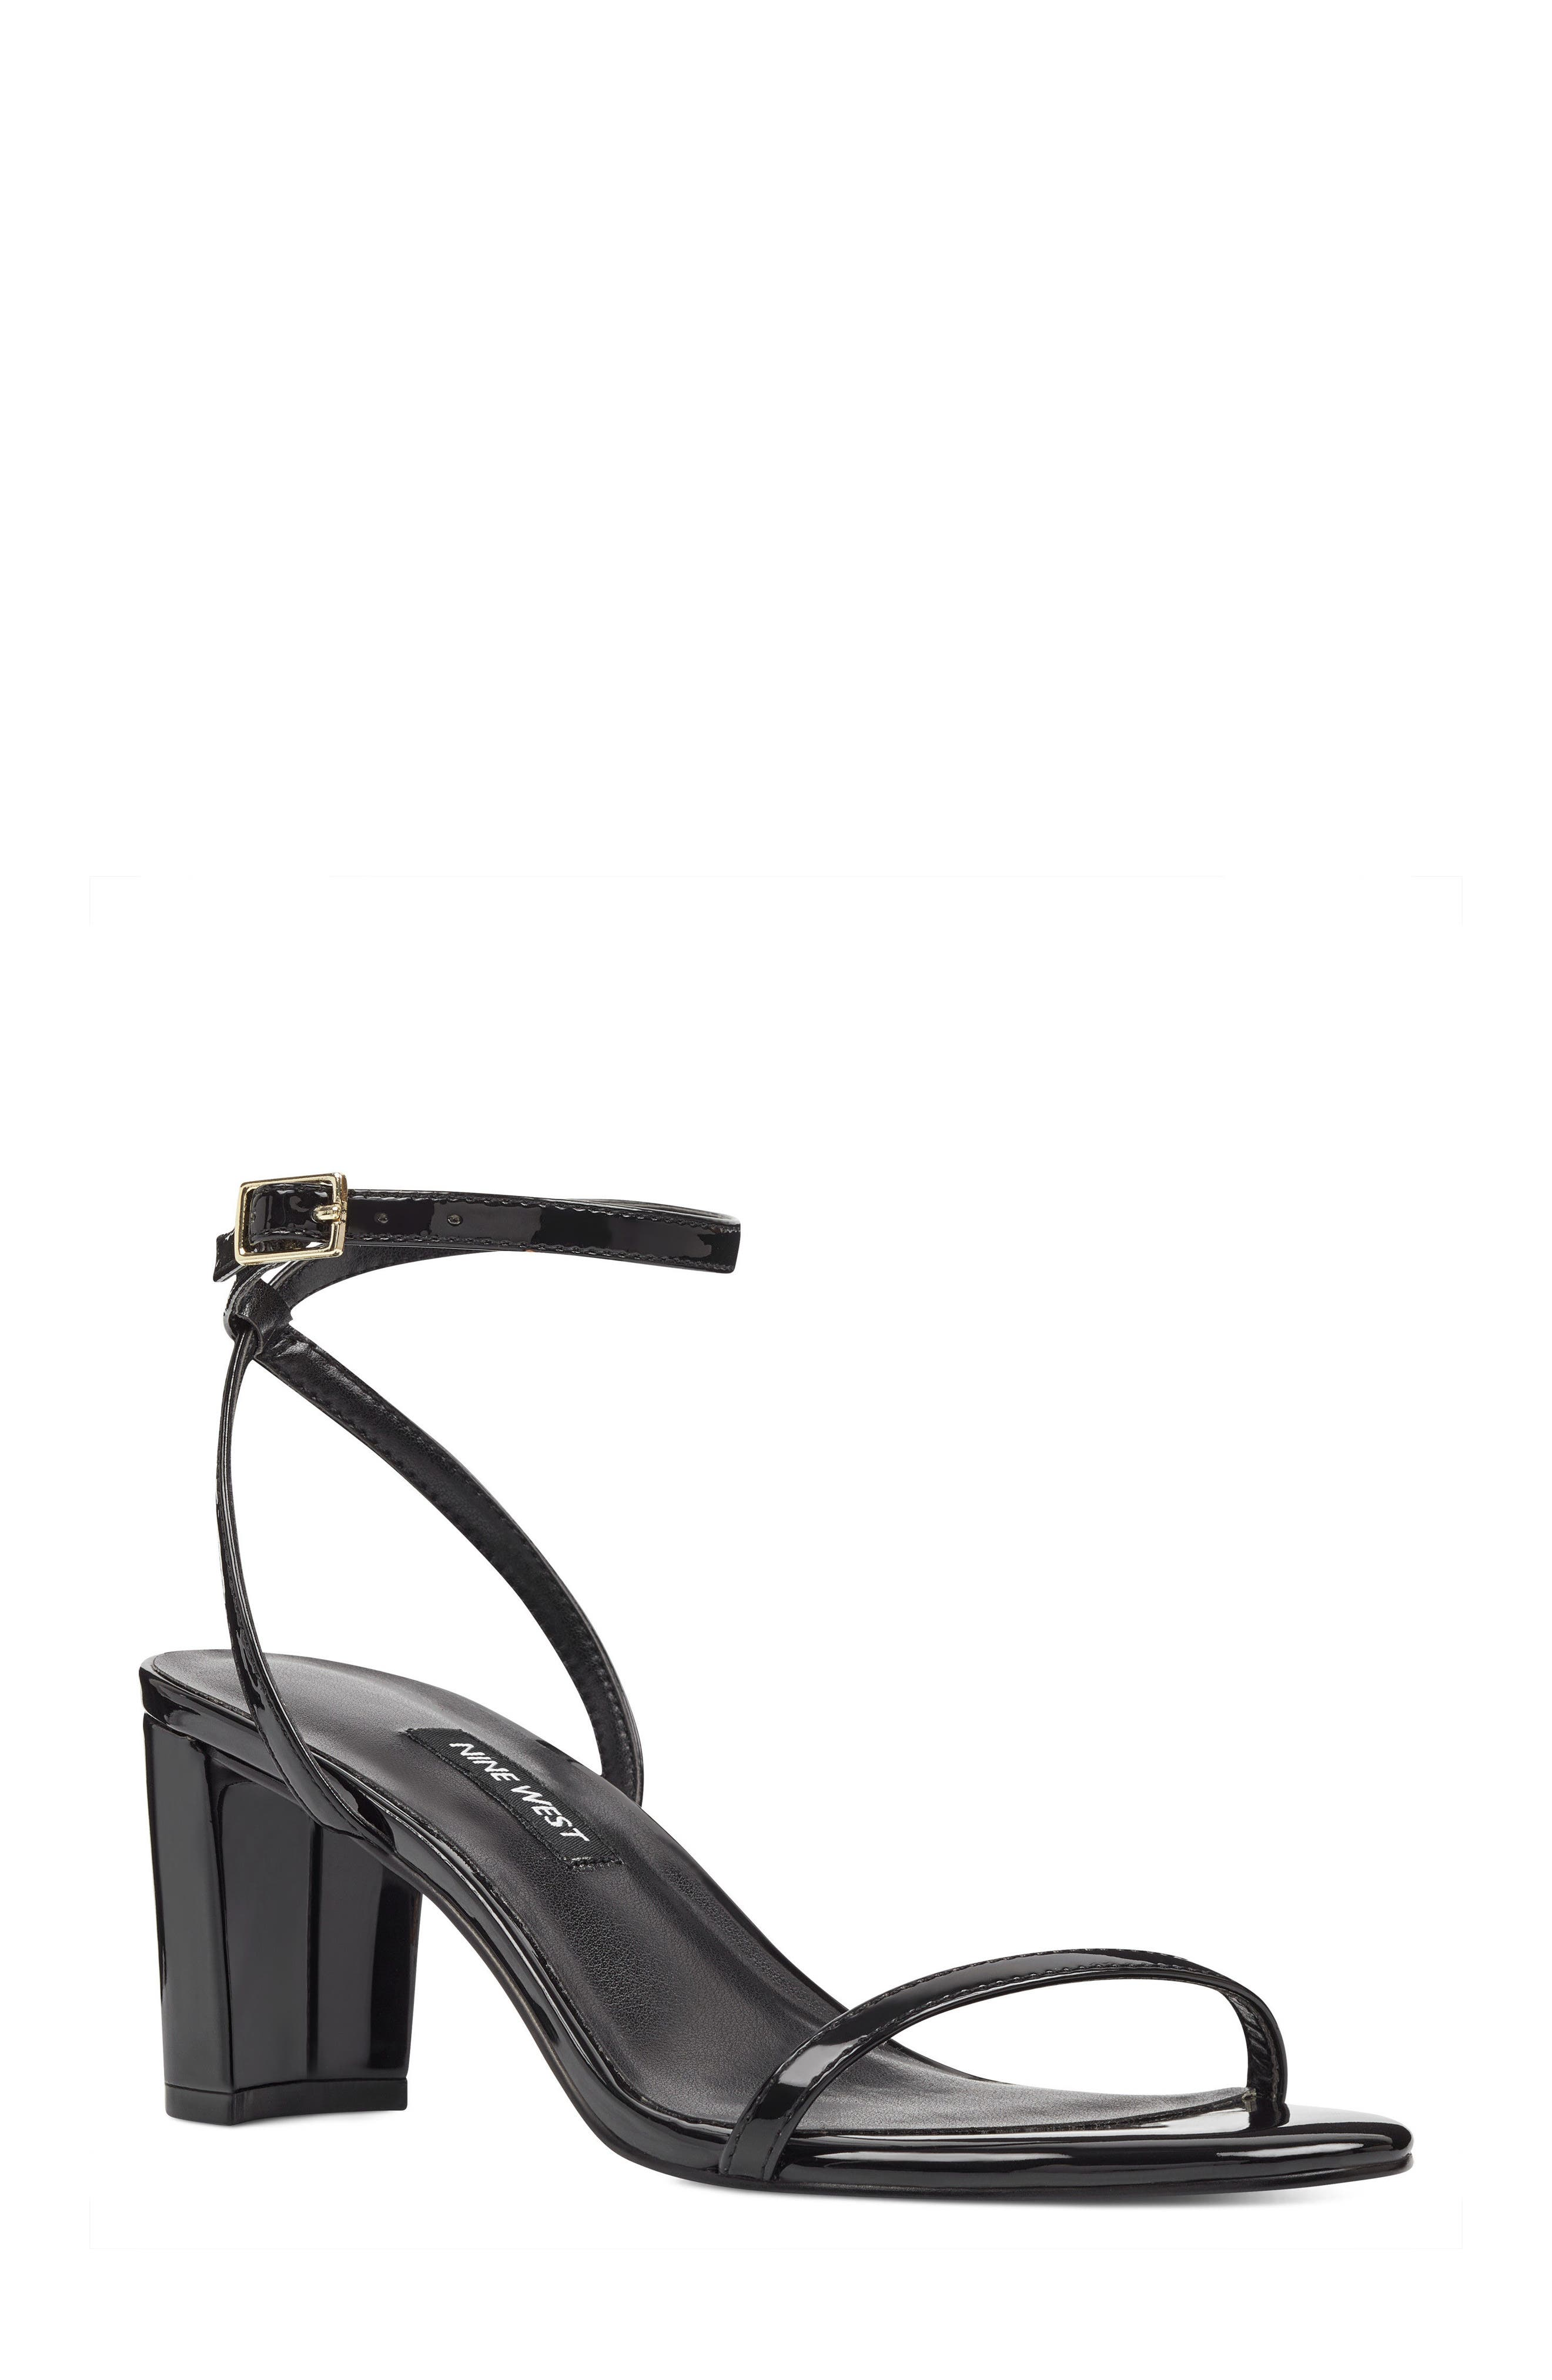 Provein Strappy Sandal,                         Main,                         color, 001